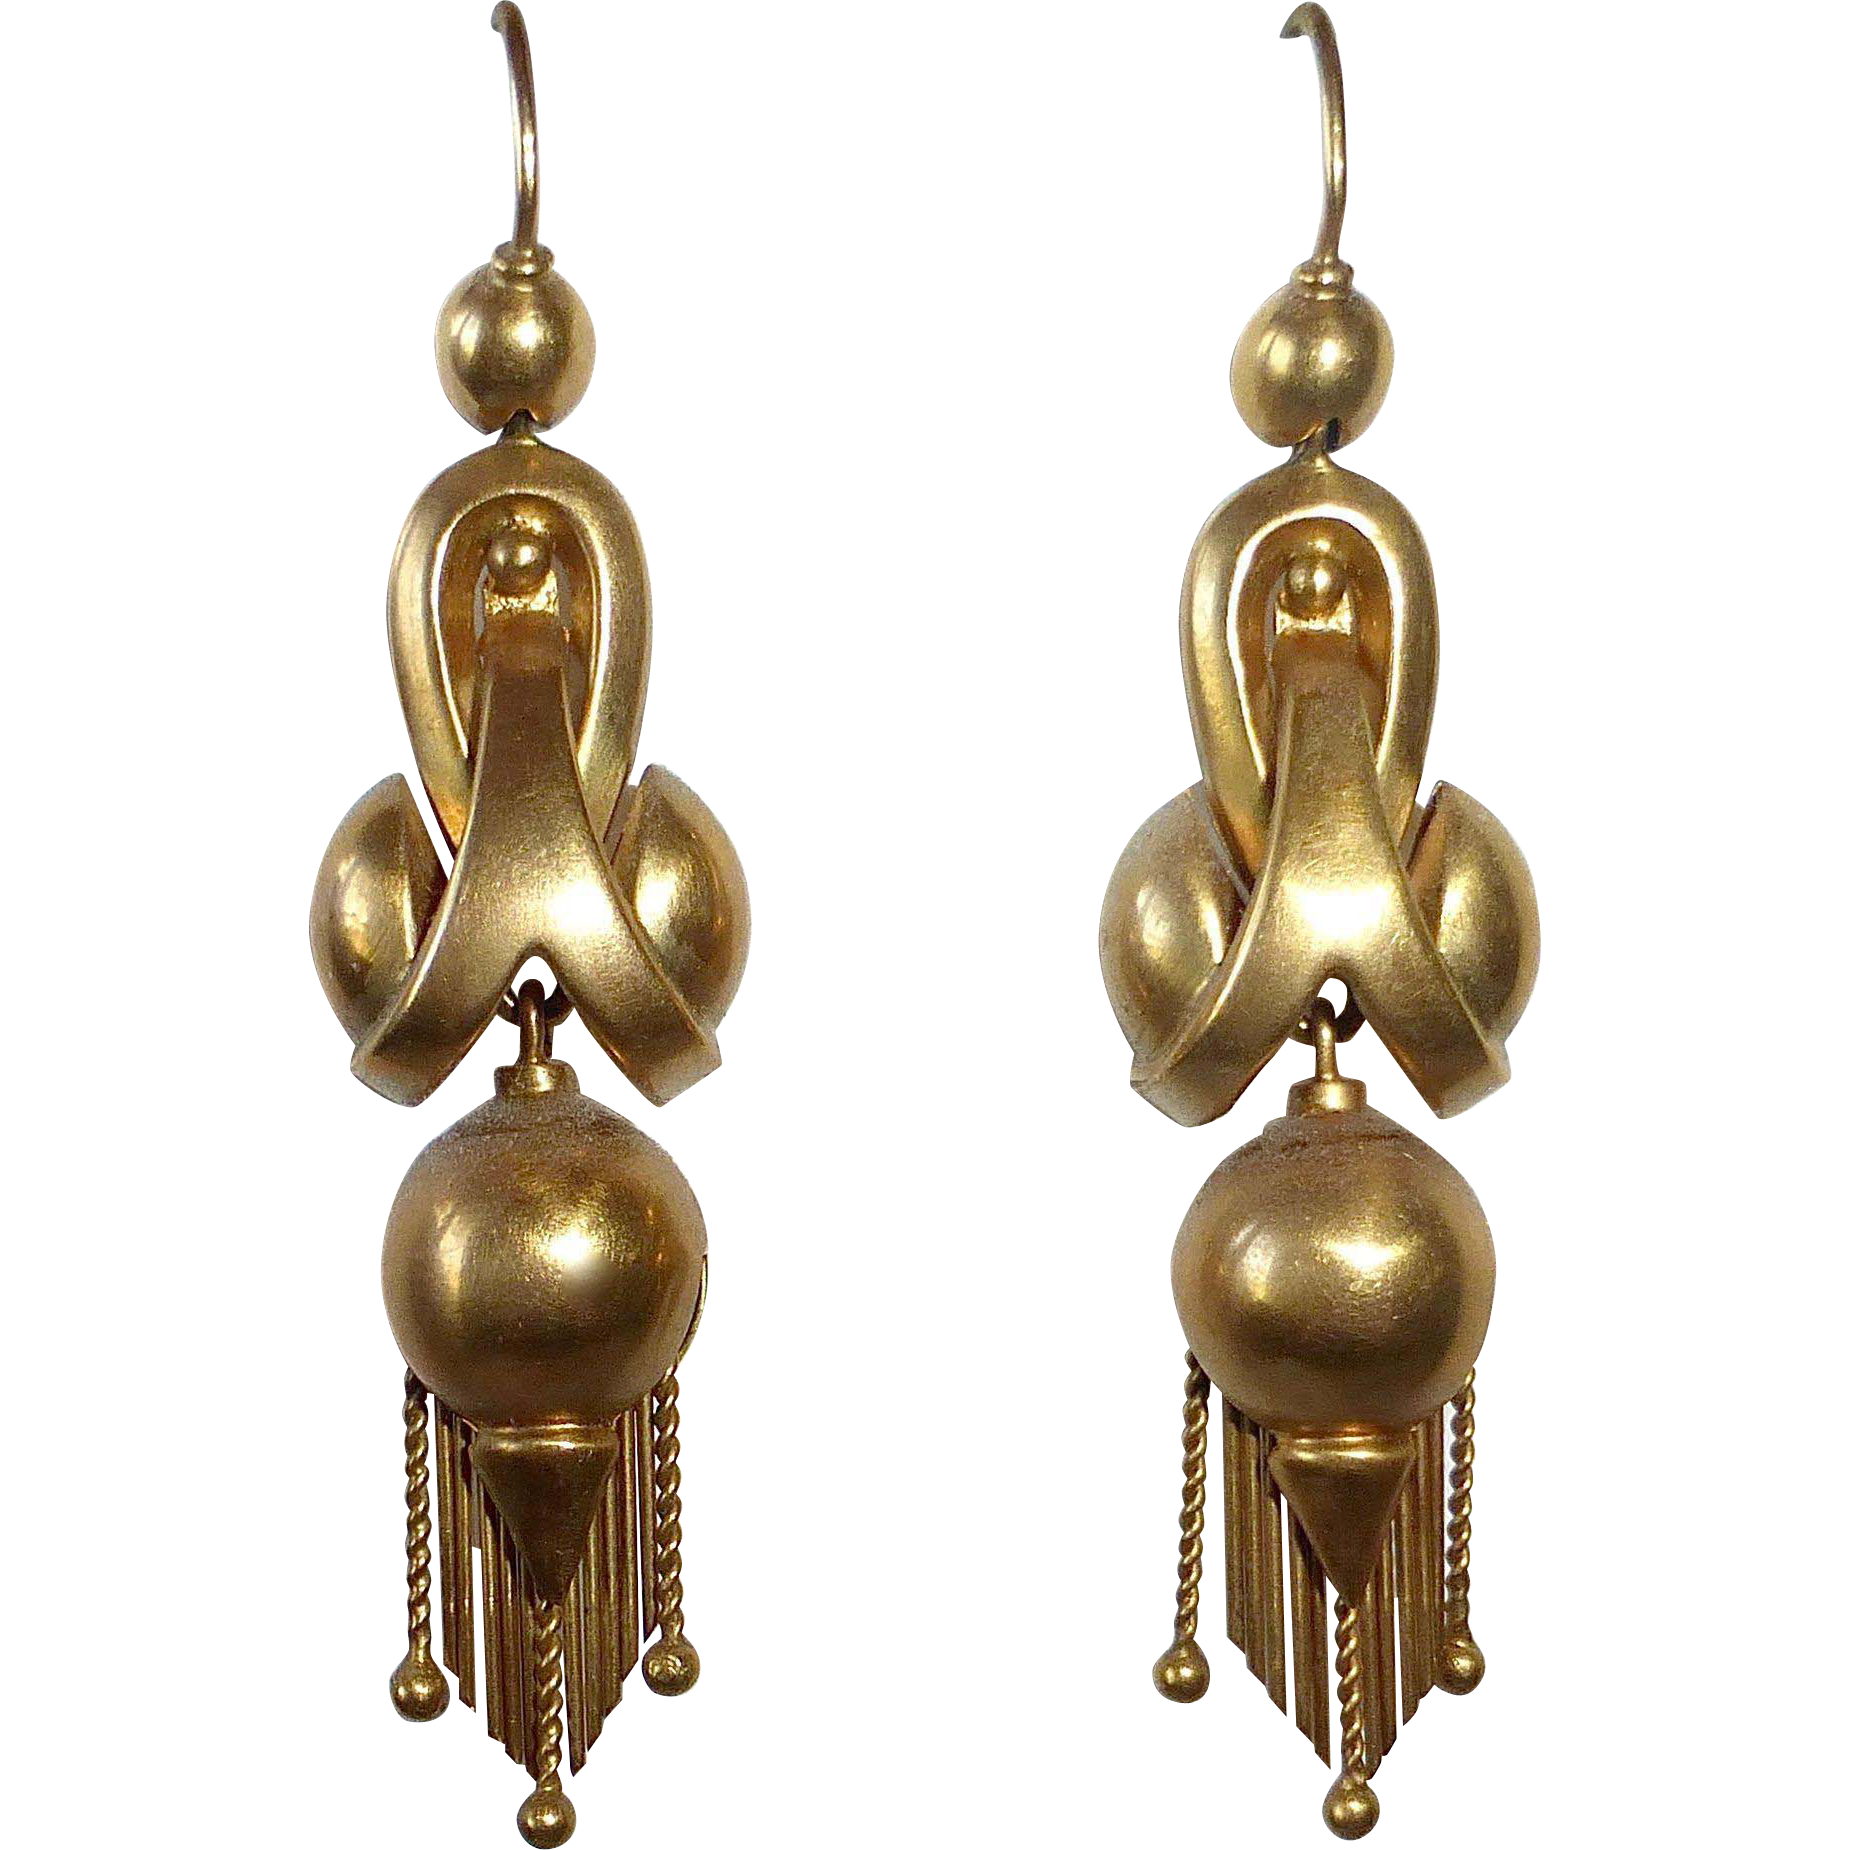 Superb 14k Antique Sculptural Drop Earrings